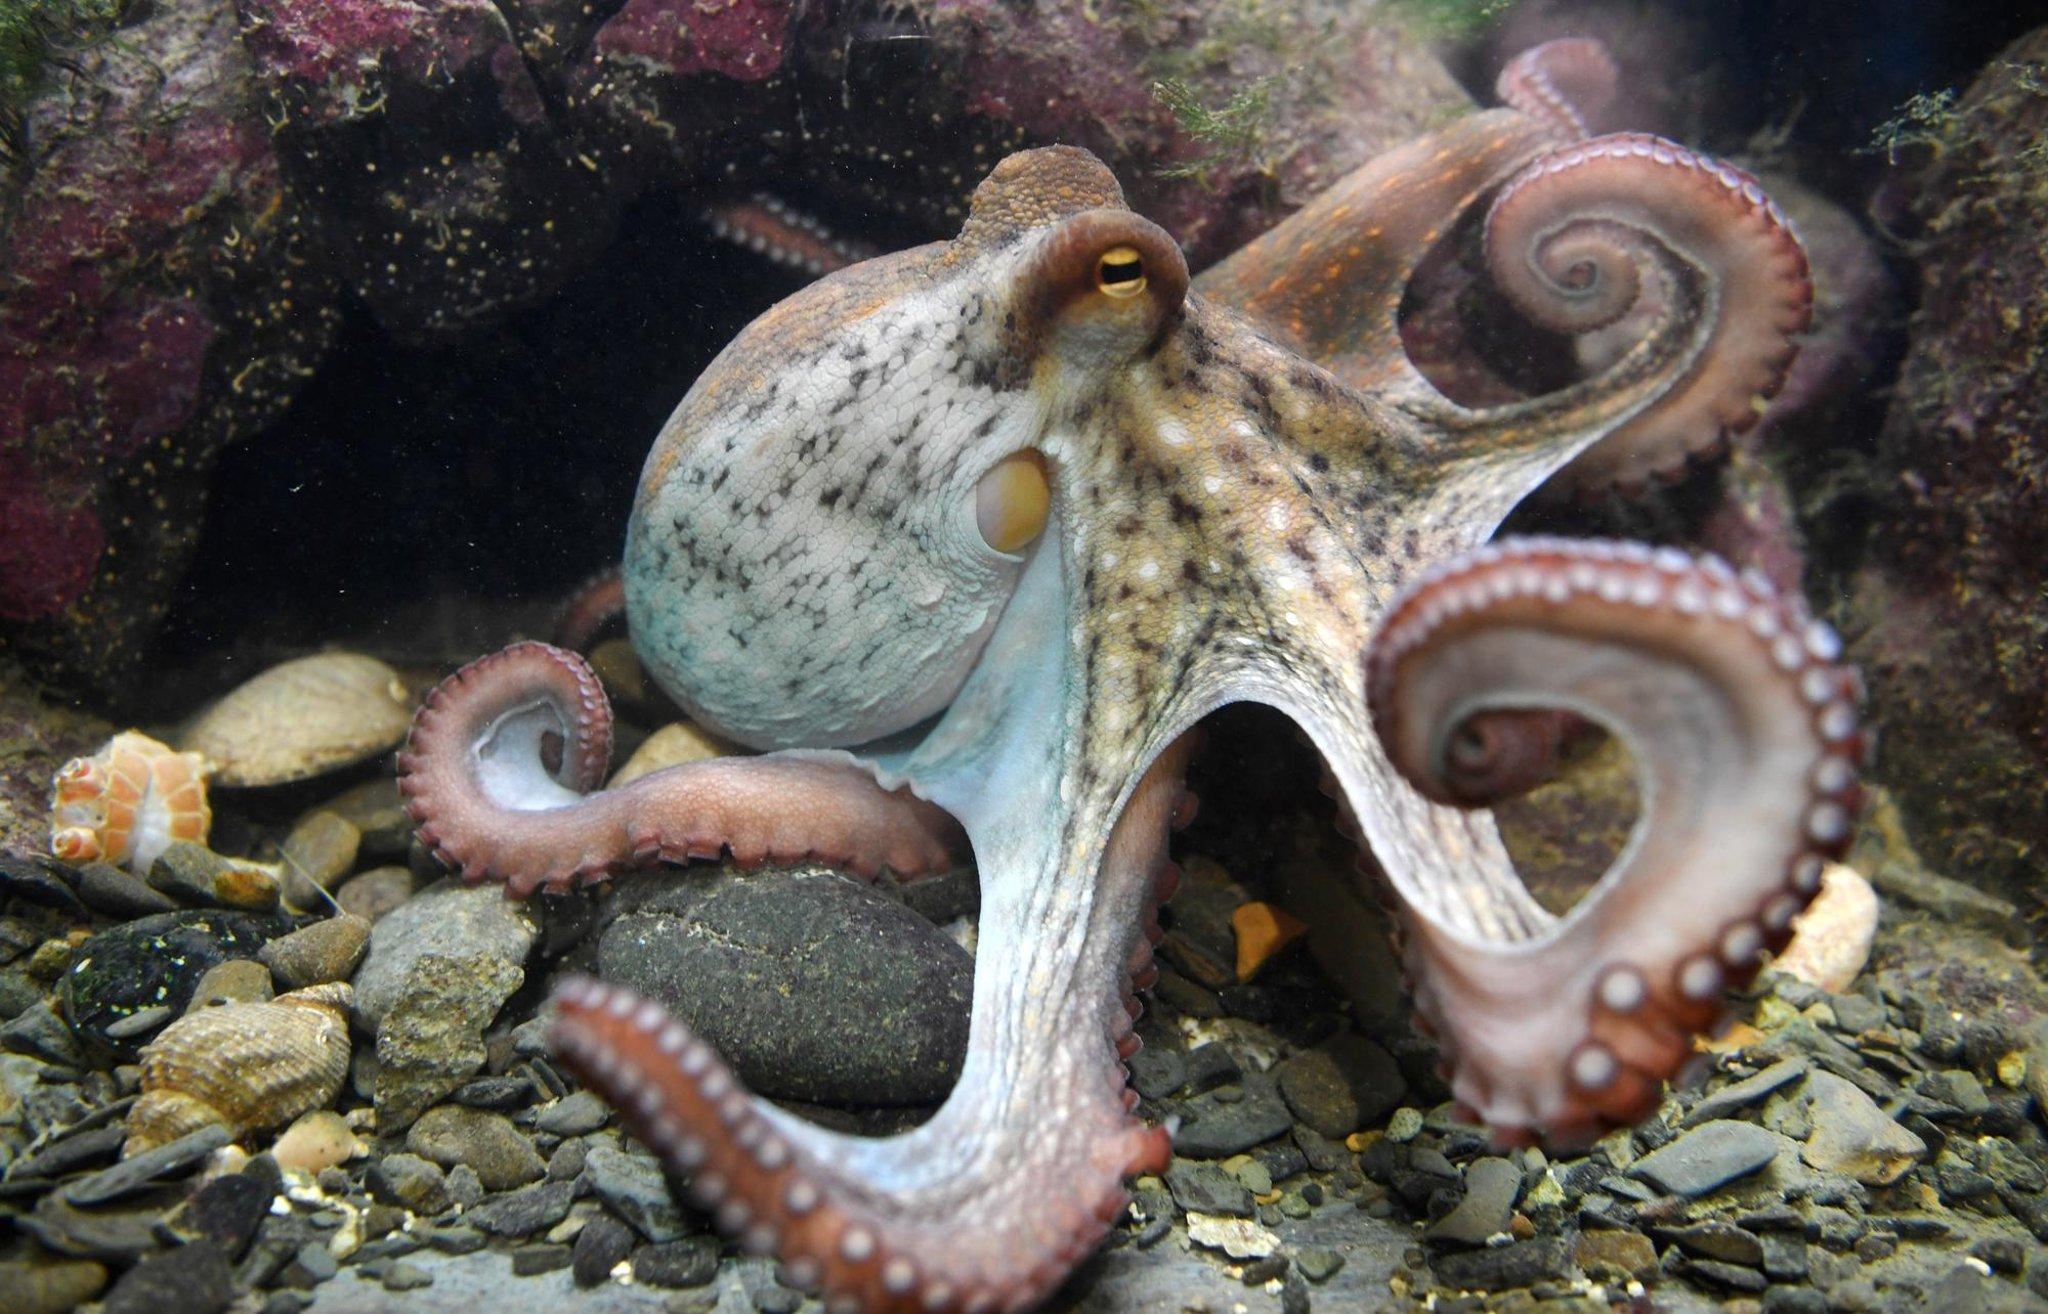 Peternakan gurita tidak bermoral, mengingat semua yang kita ketahui tentang hewan yang sangat cerdas dan penyendiri ini – Philip Lymbery